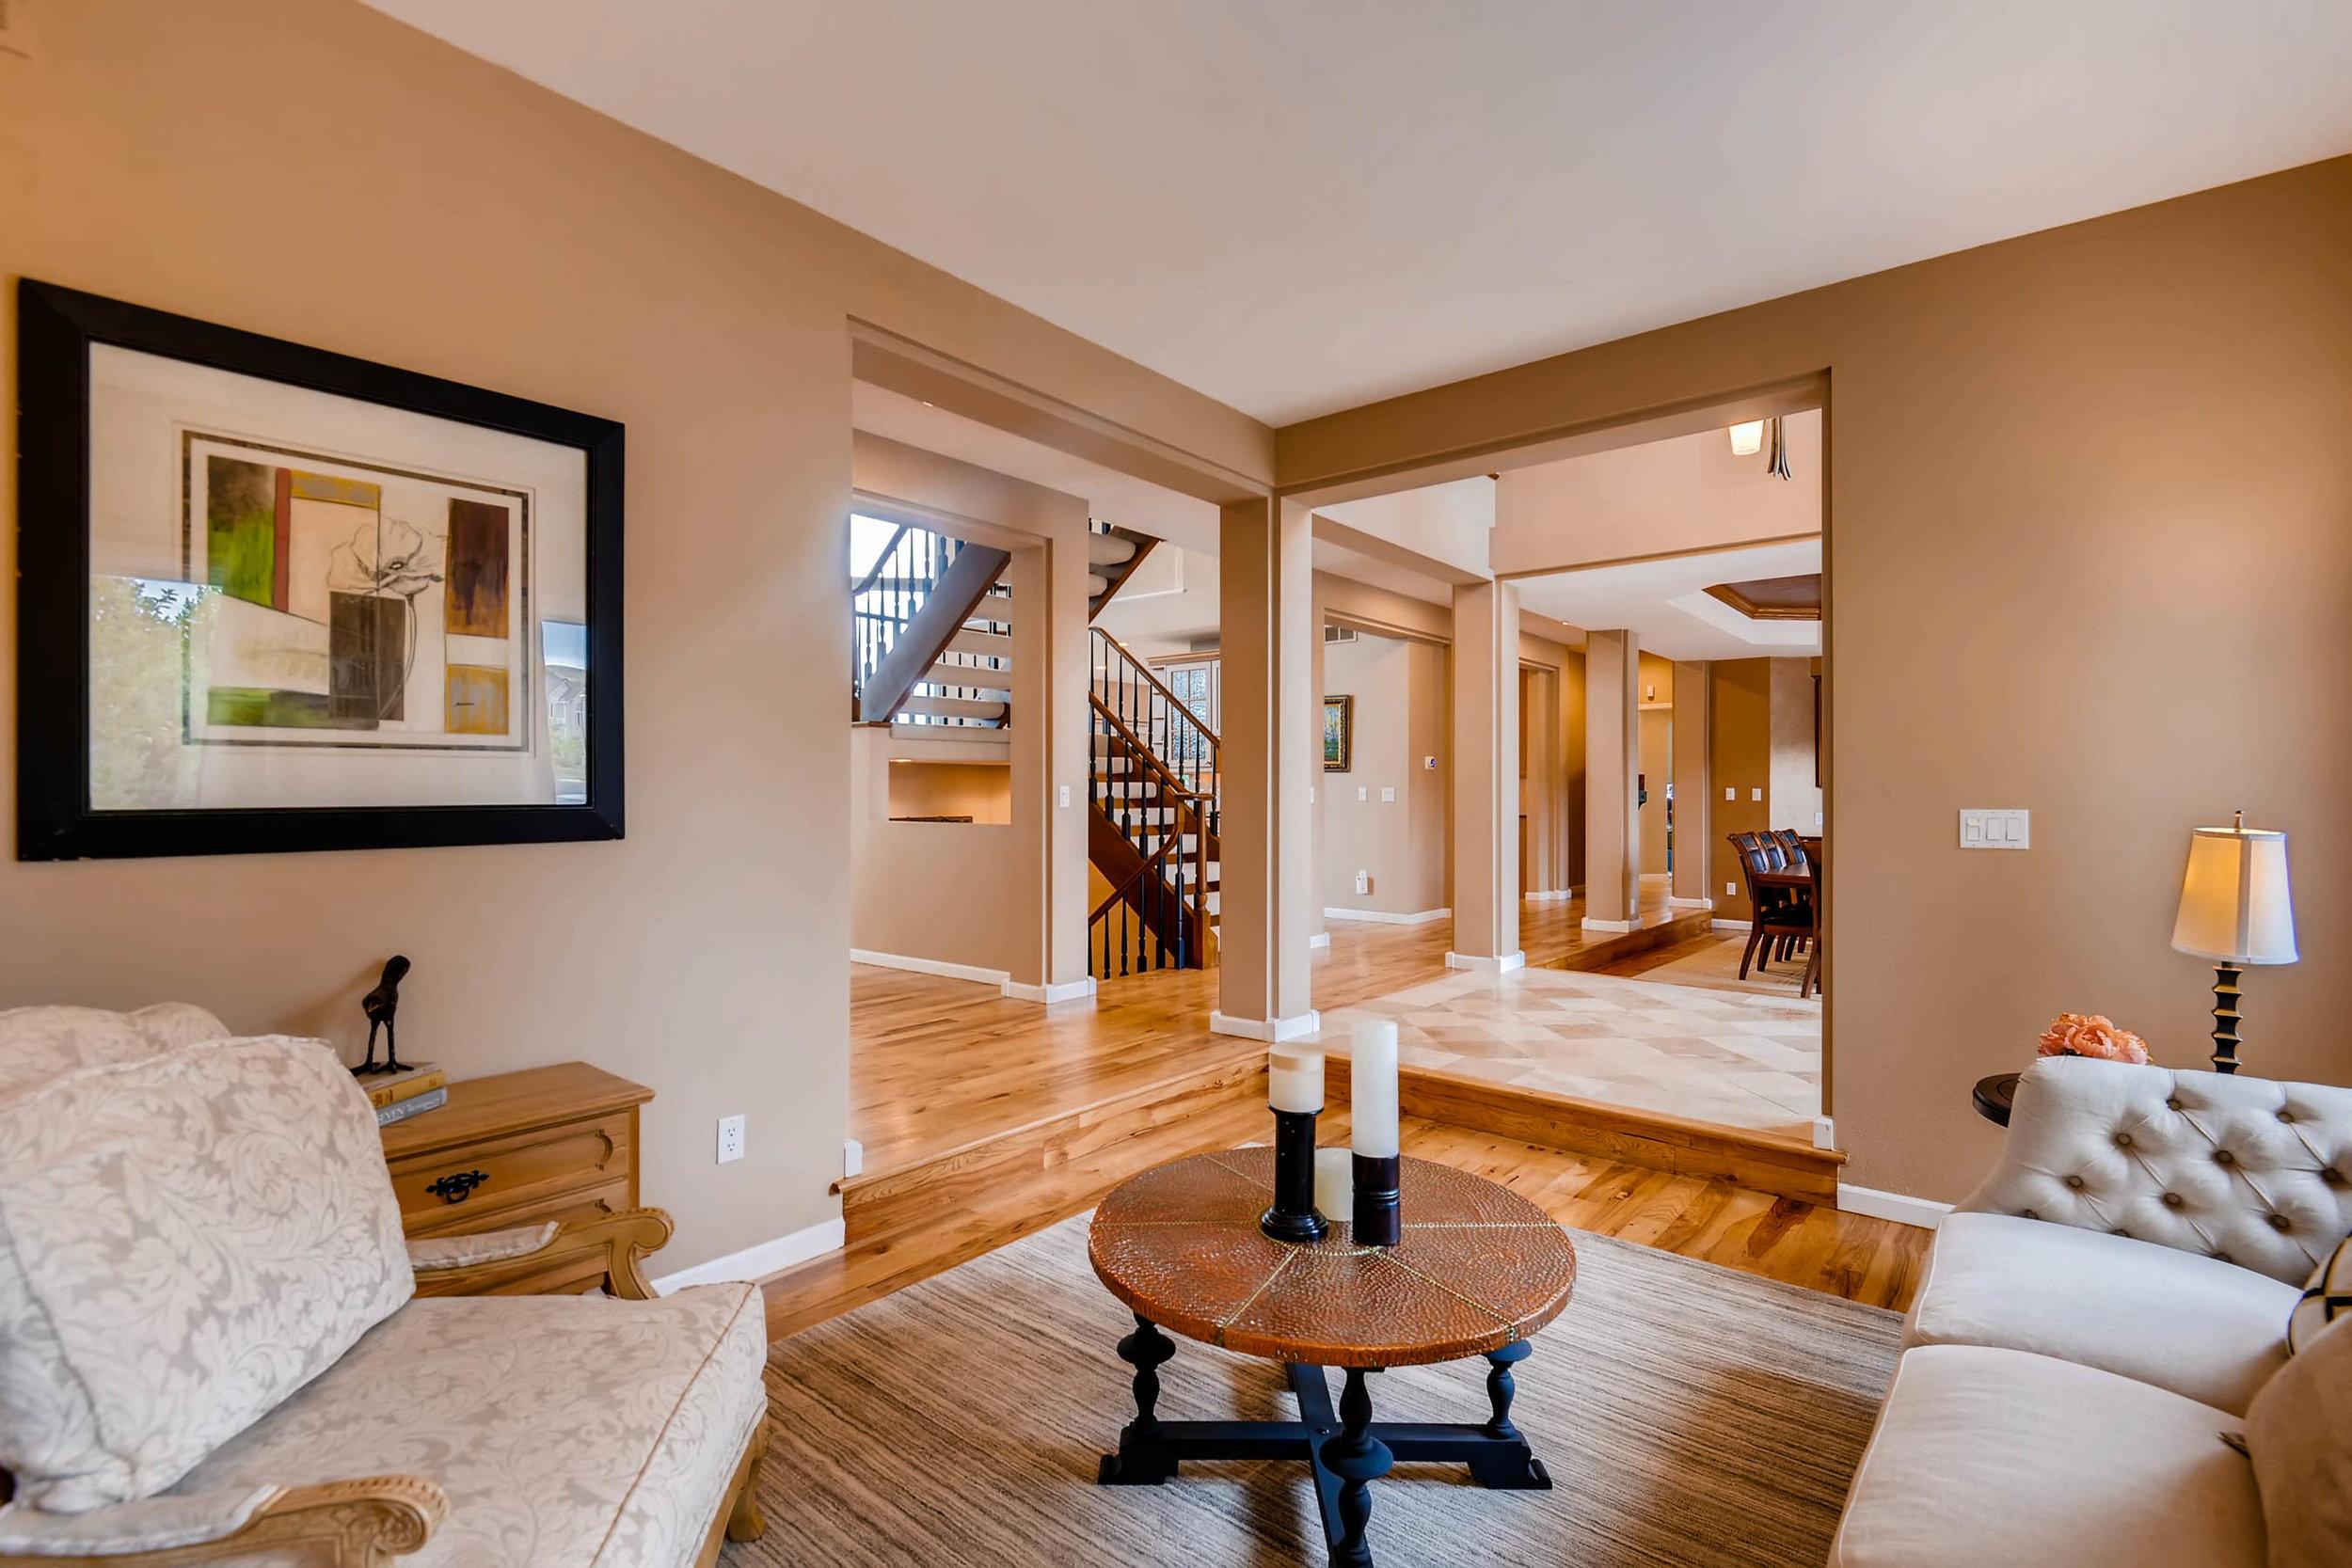 2449 S Yank Ct Lakewood CO-print-006-4-Living Room-2700x1800-300dpi.jpg